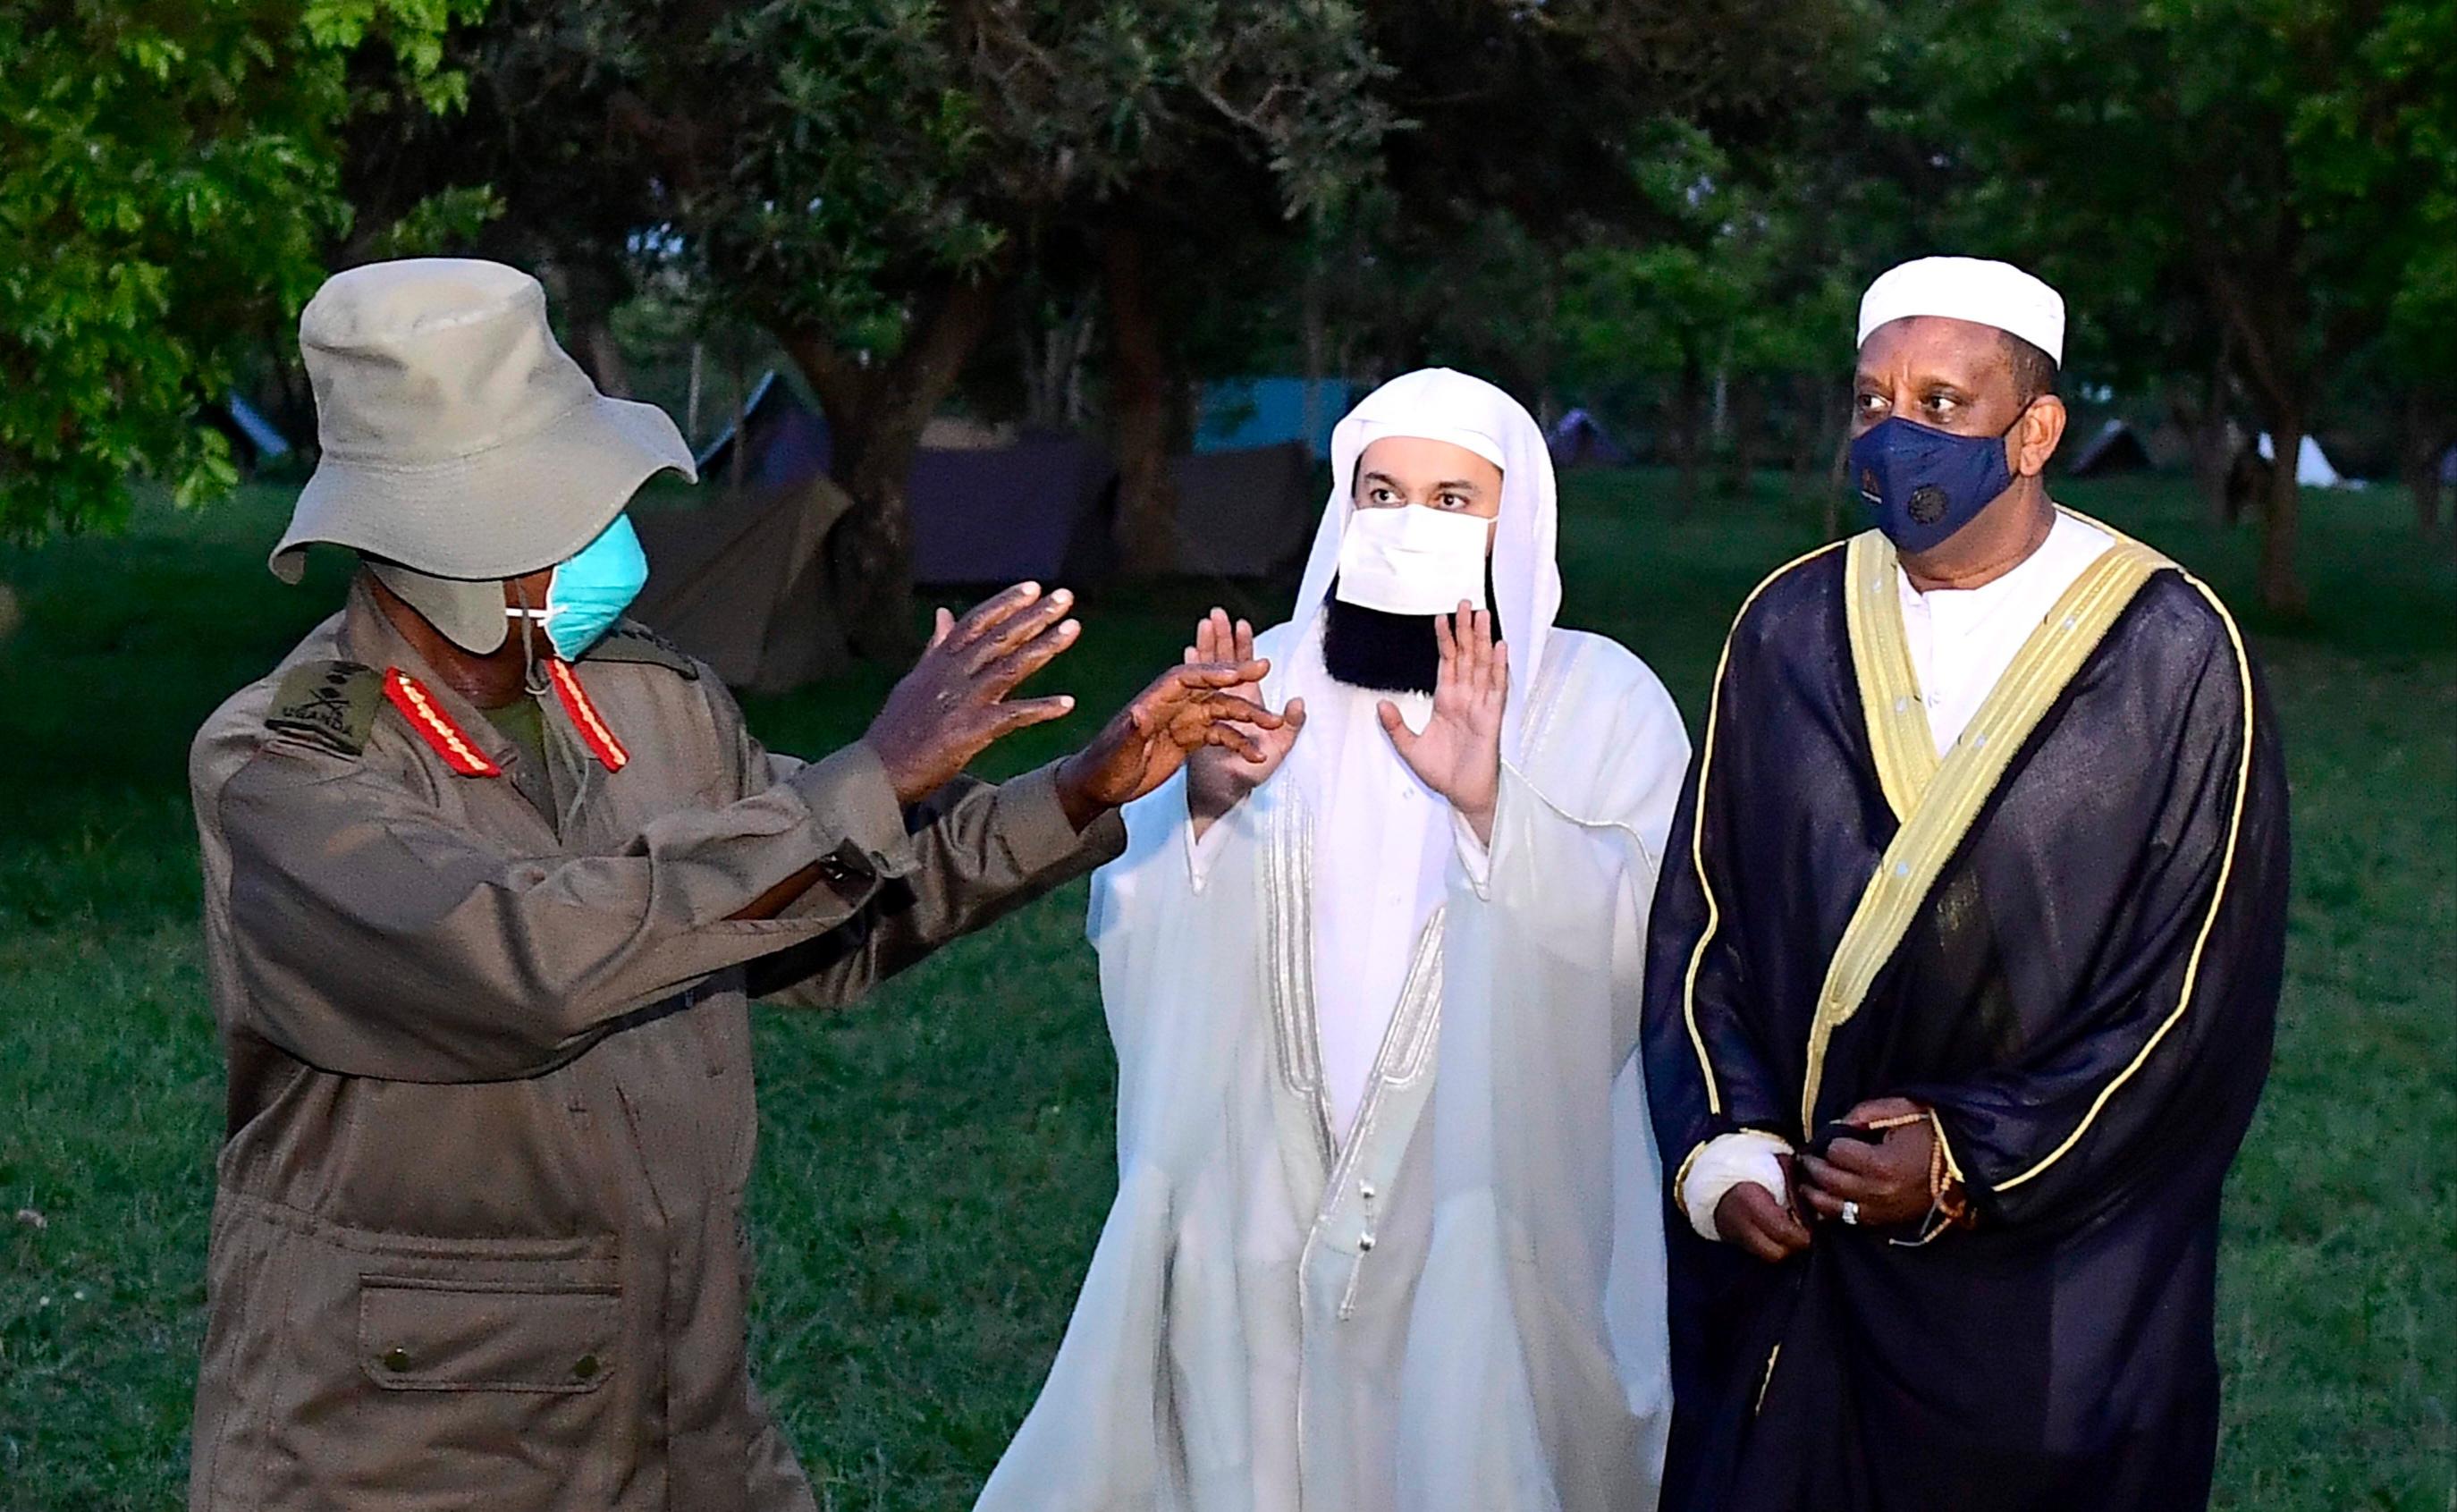 President Museveni and Sheikh Menk (middle) at Kyankwanzi State Lodge on Tuesday